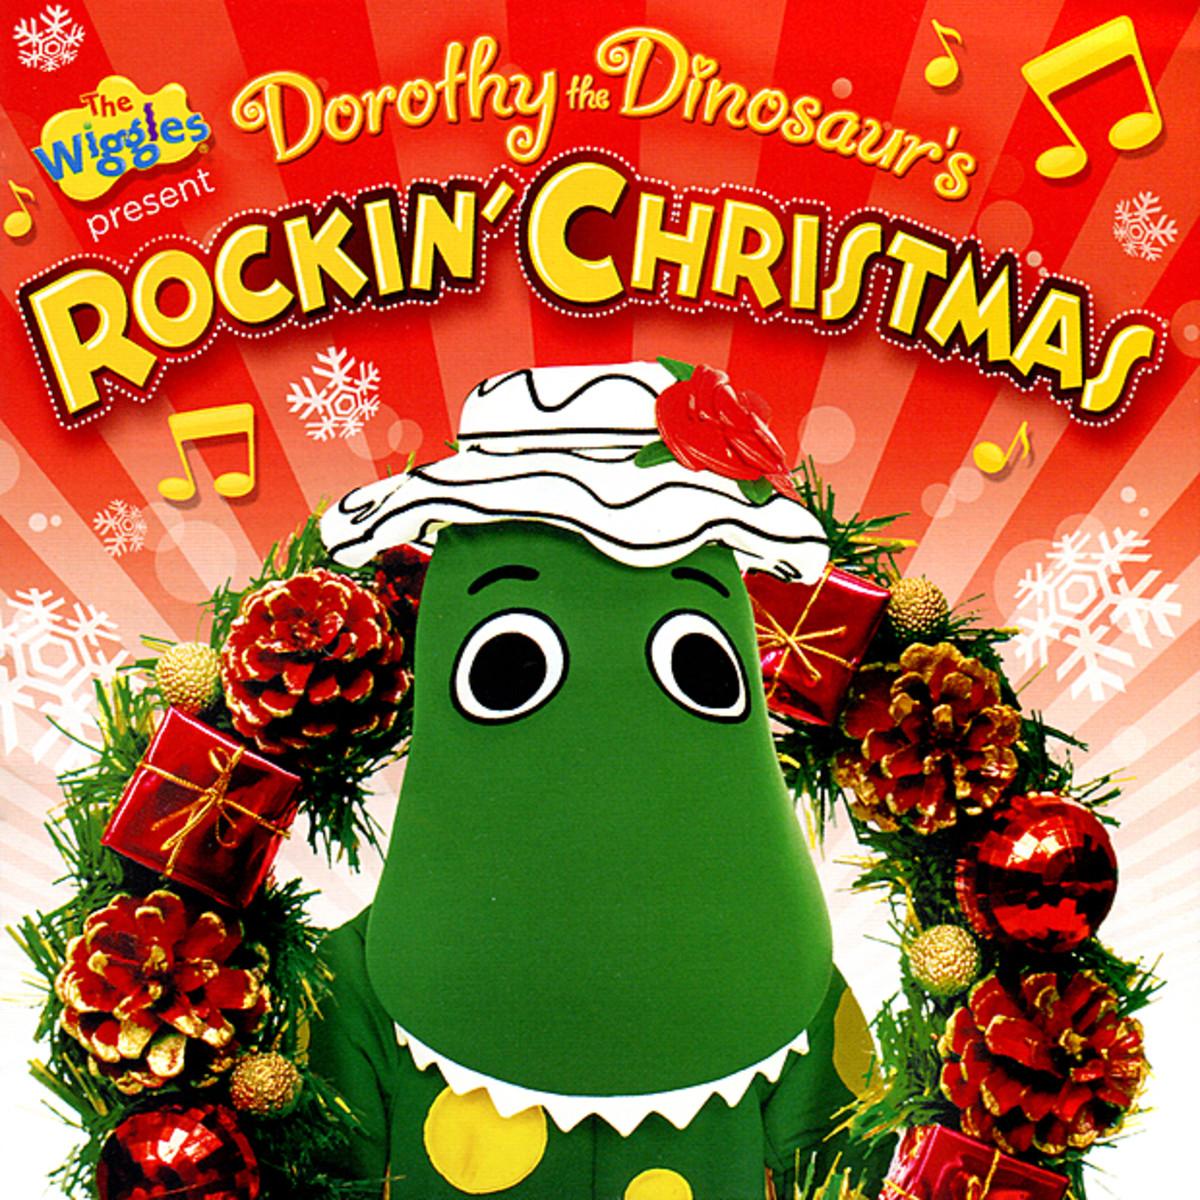 Dorothy the Dinosaur's Rockin' Christmas (album)